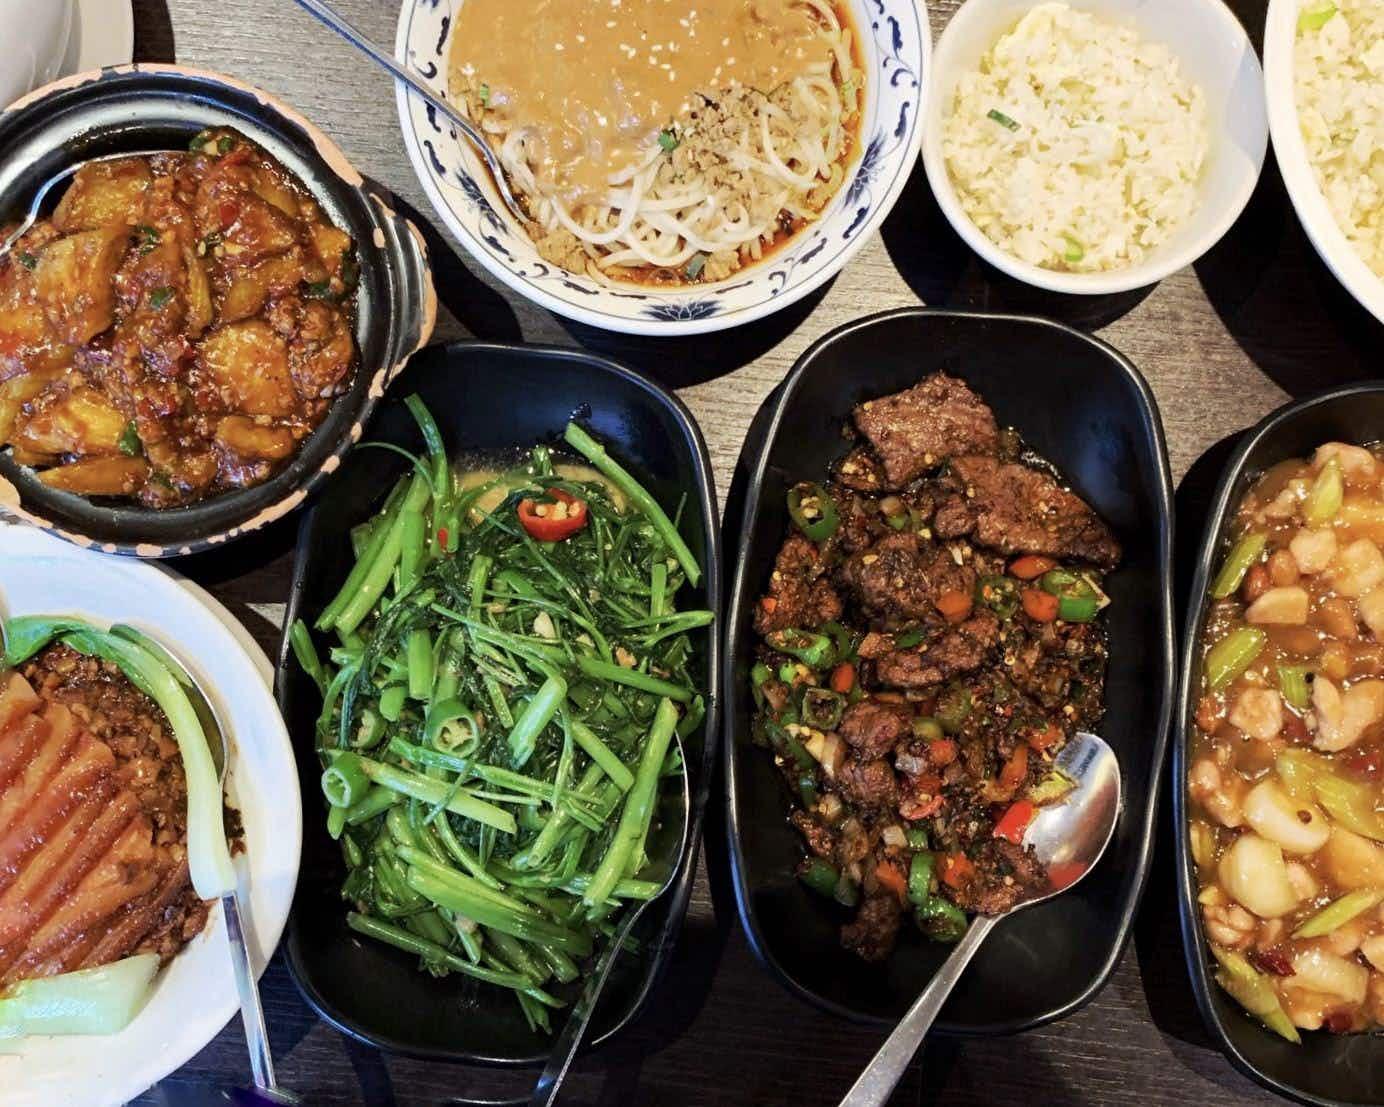 Shu eating pork biang biang noodles at Master Wei © Shu Shi Lin / Lonely Planet